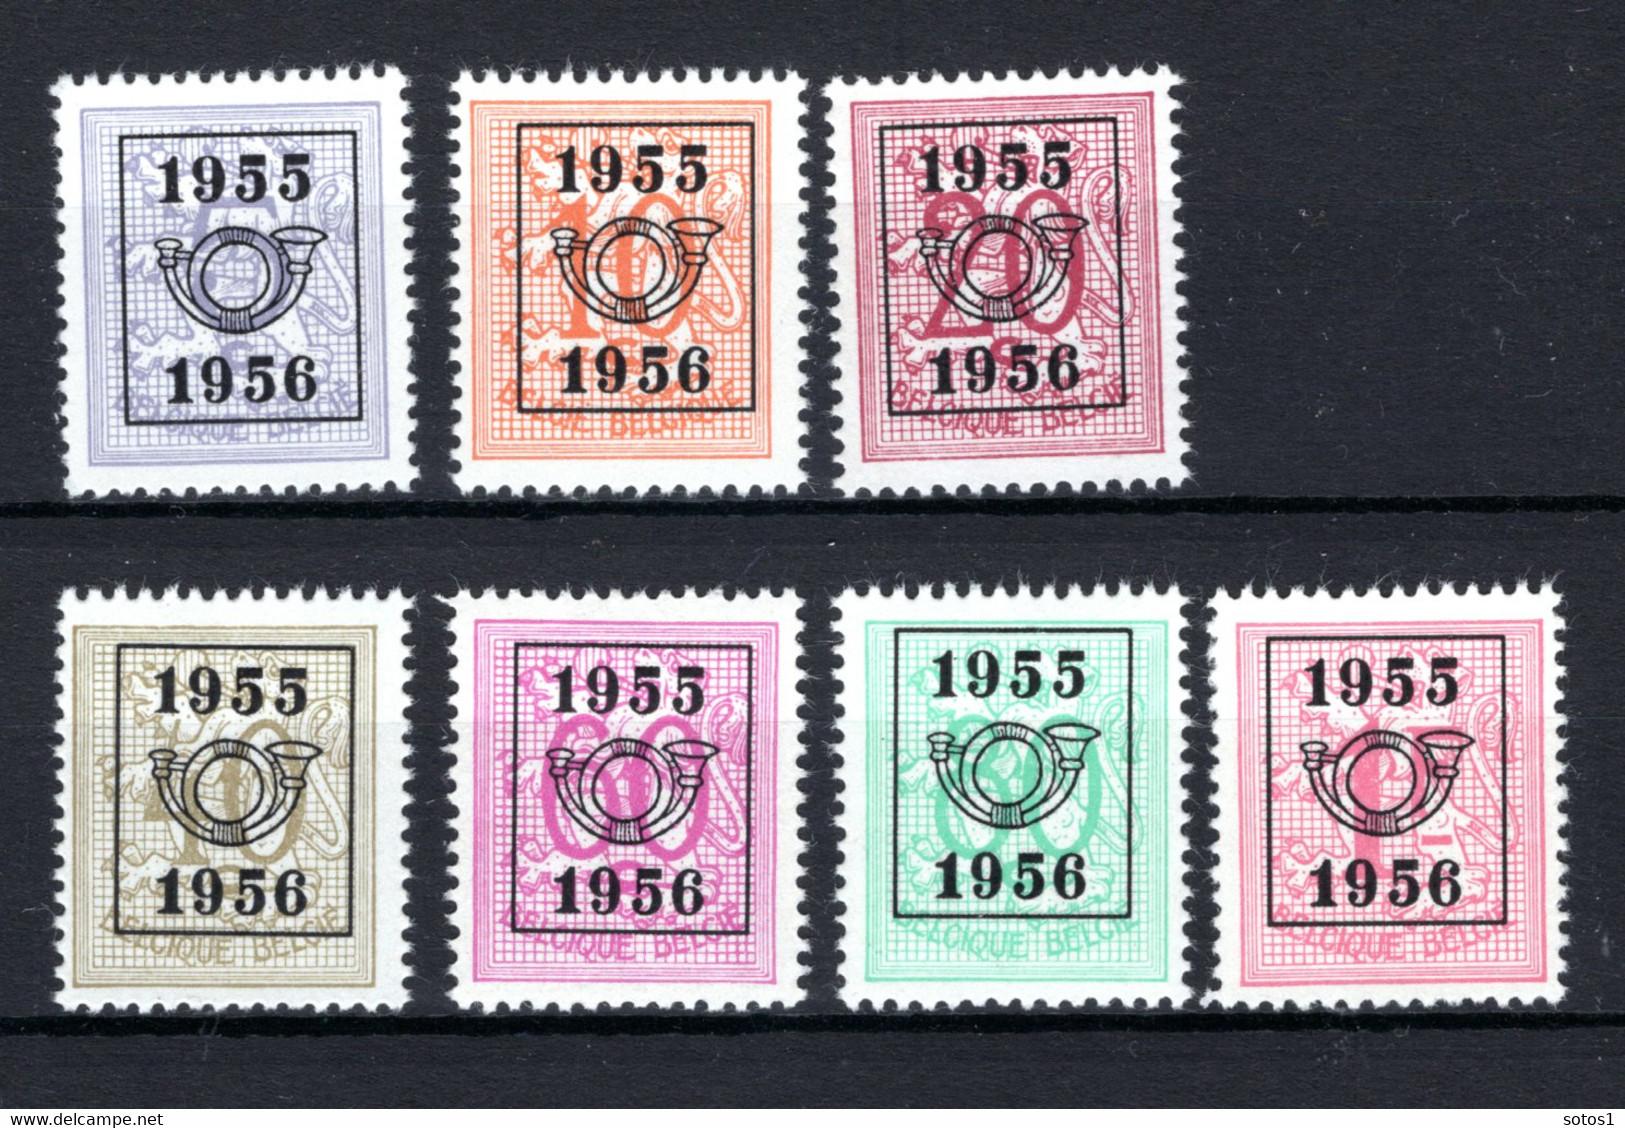 PRE652/658 MNH** 1955 - Cijfer Op Heraldieke Leeuw Type E - REEKS 48 - Sobreimpresos 1951-80 (Chifras Sobre El Leon)